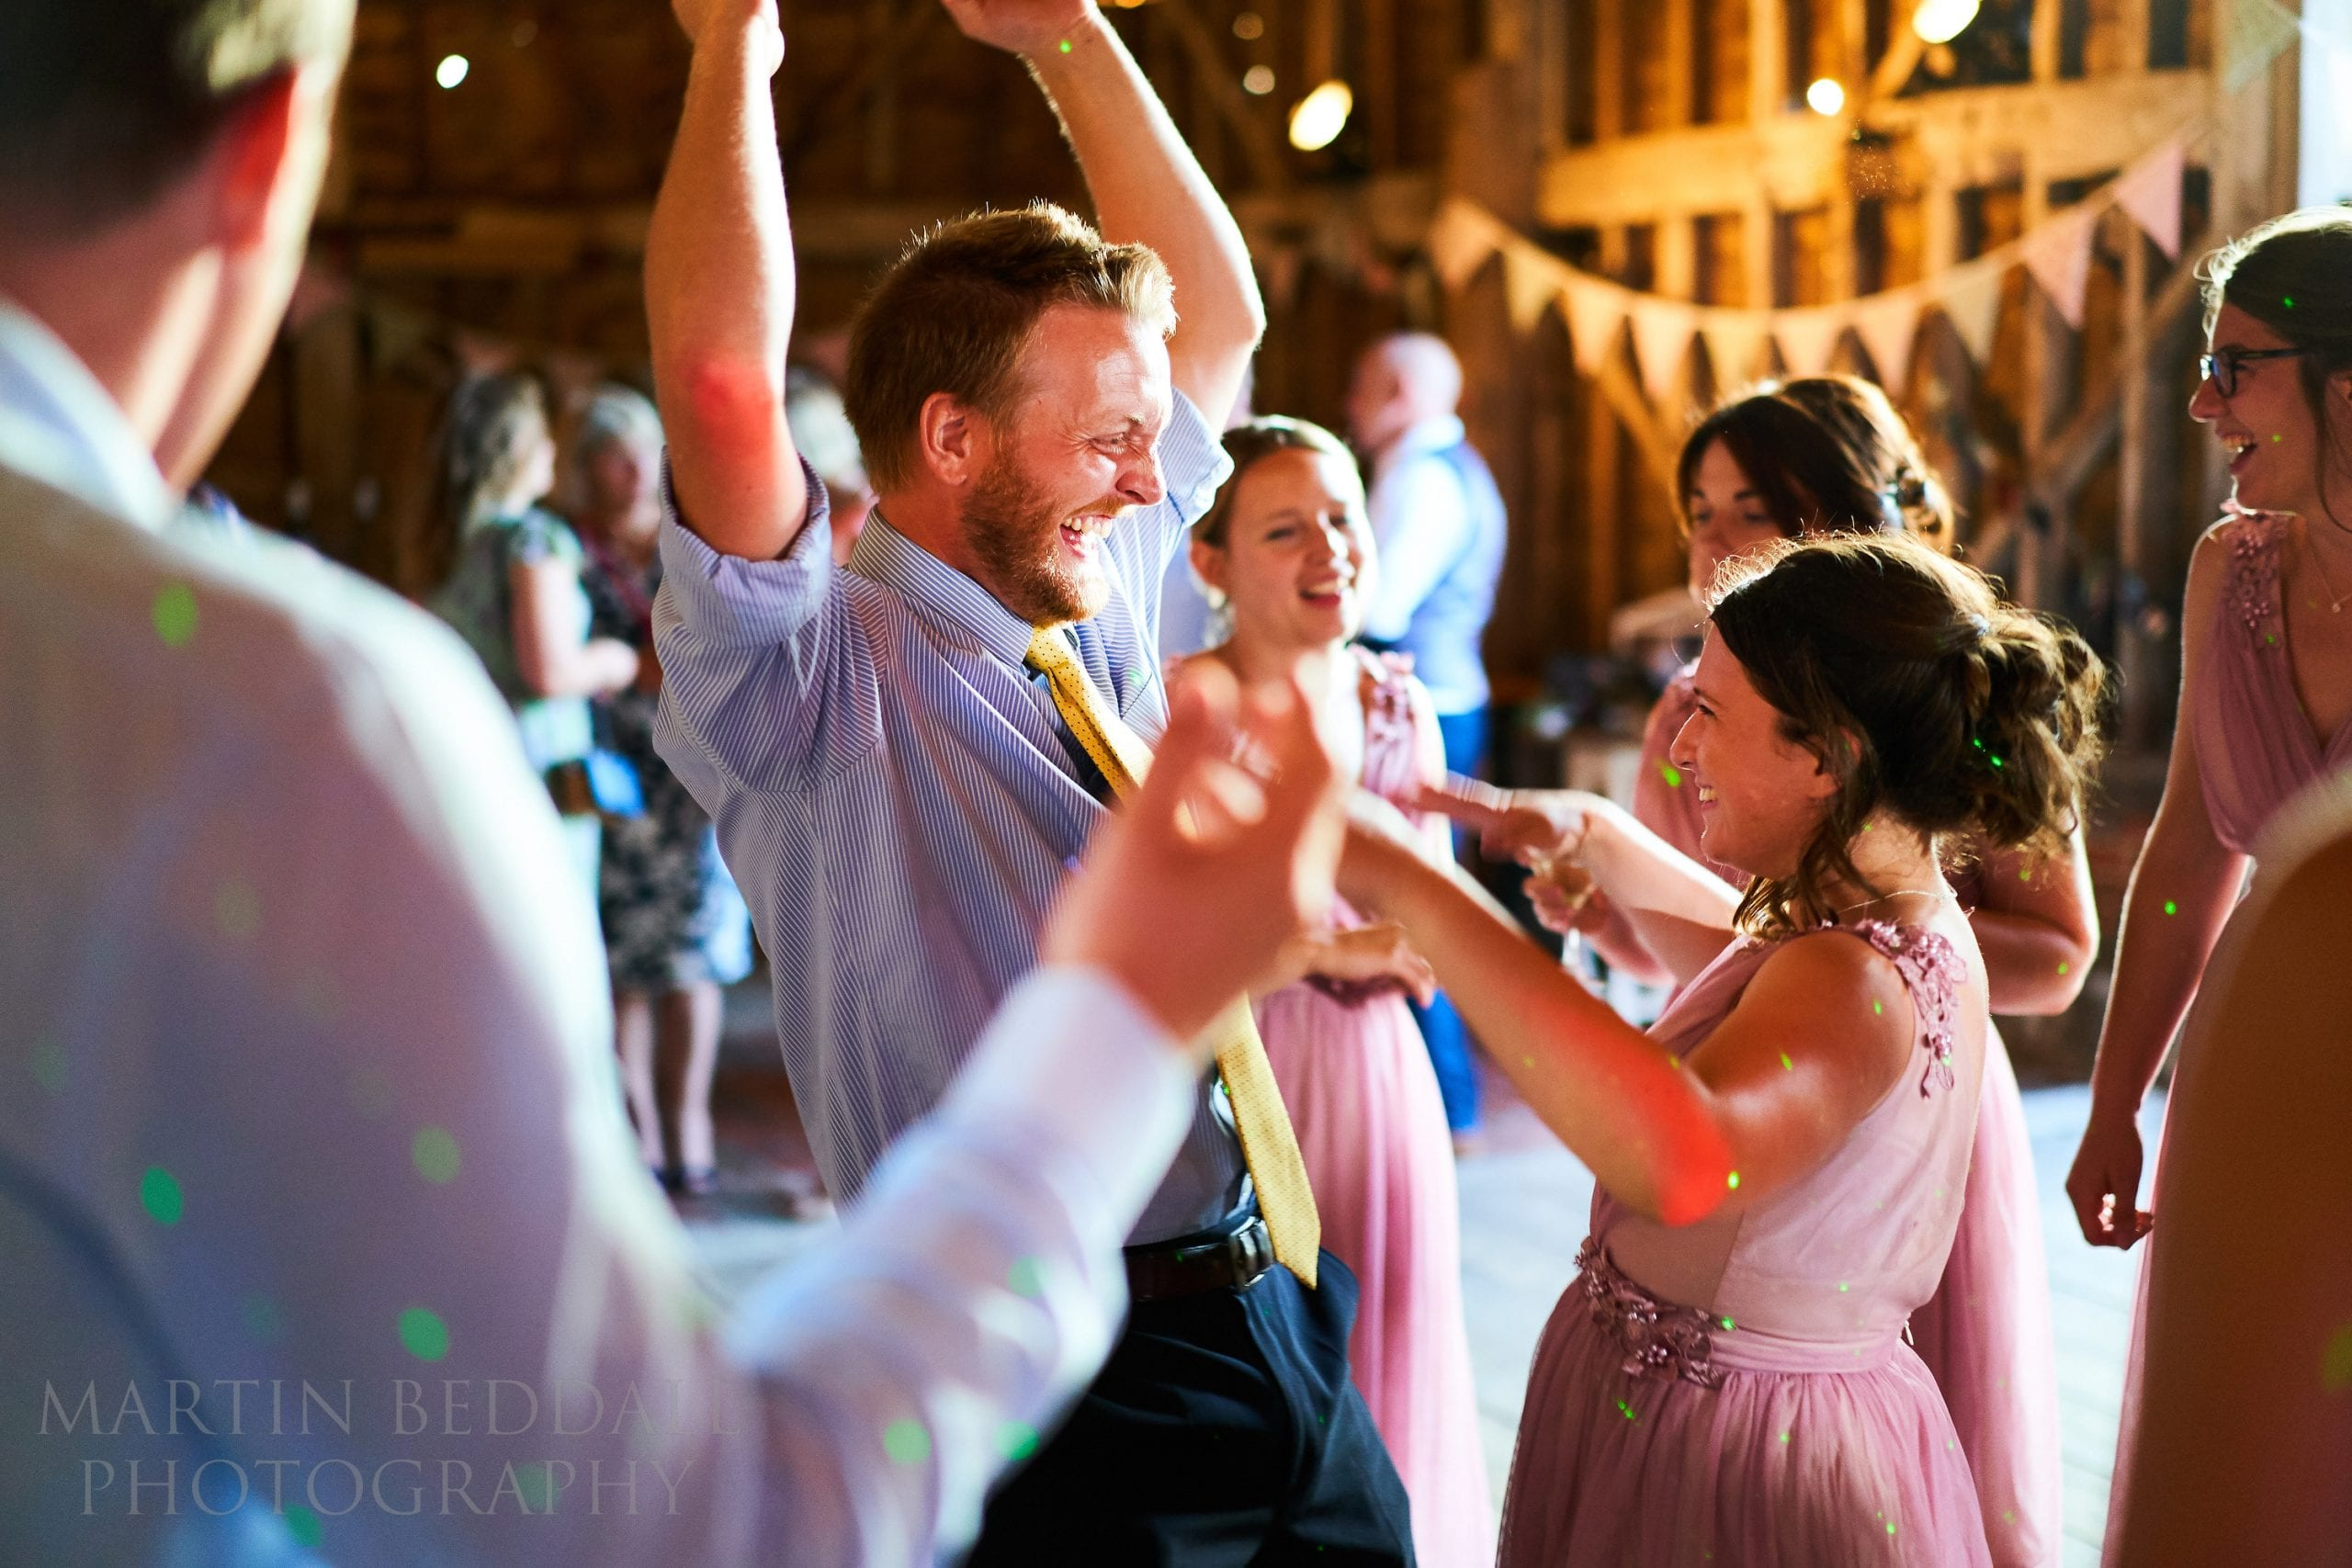 Dancing in The Secret Barn